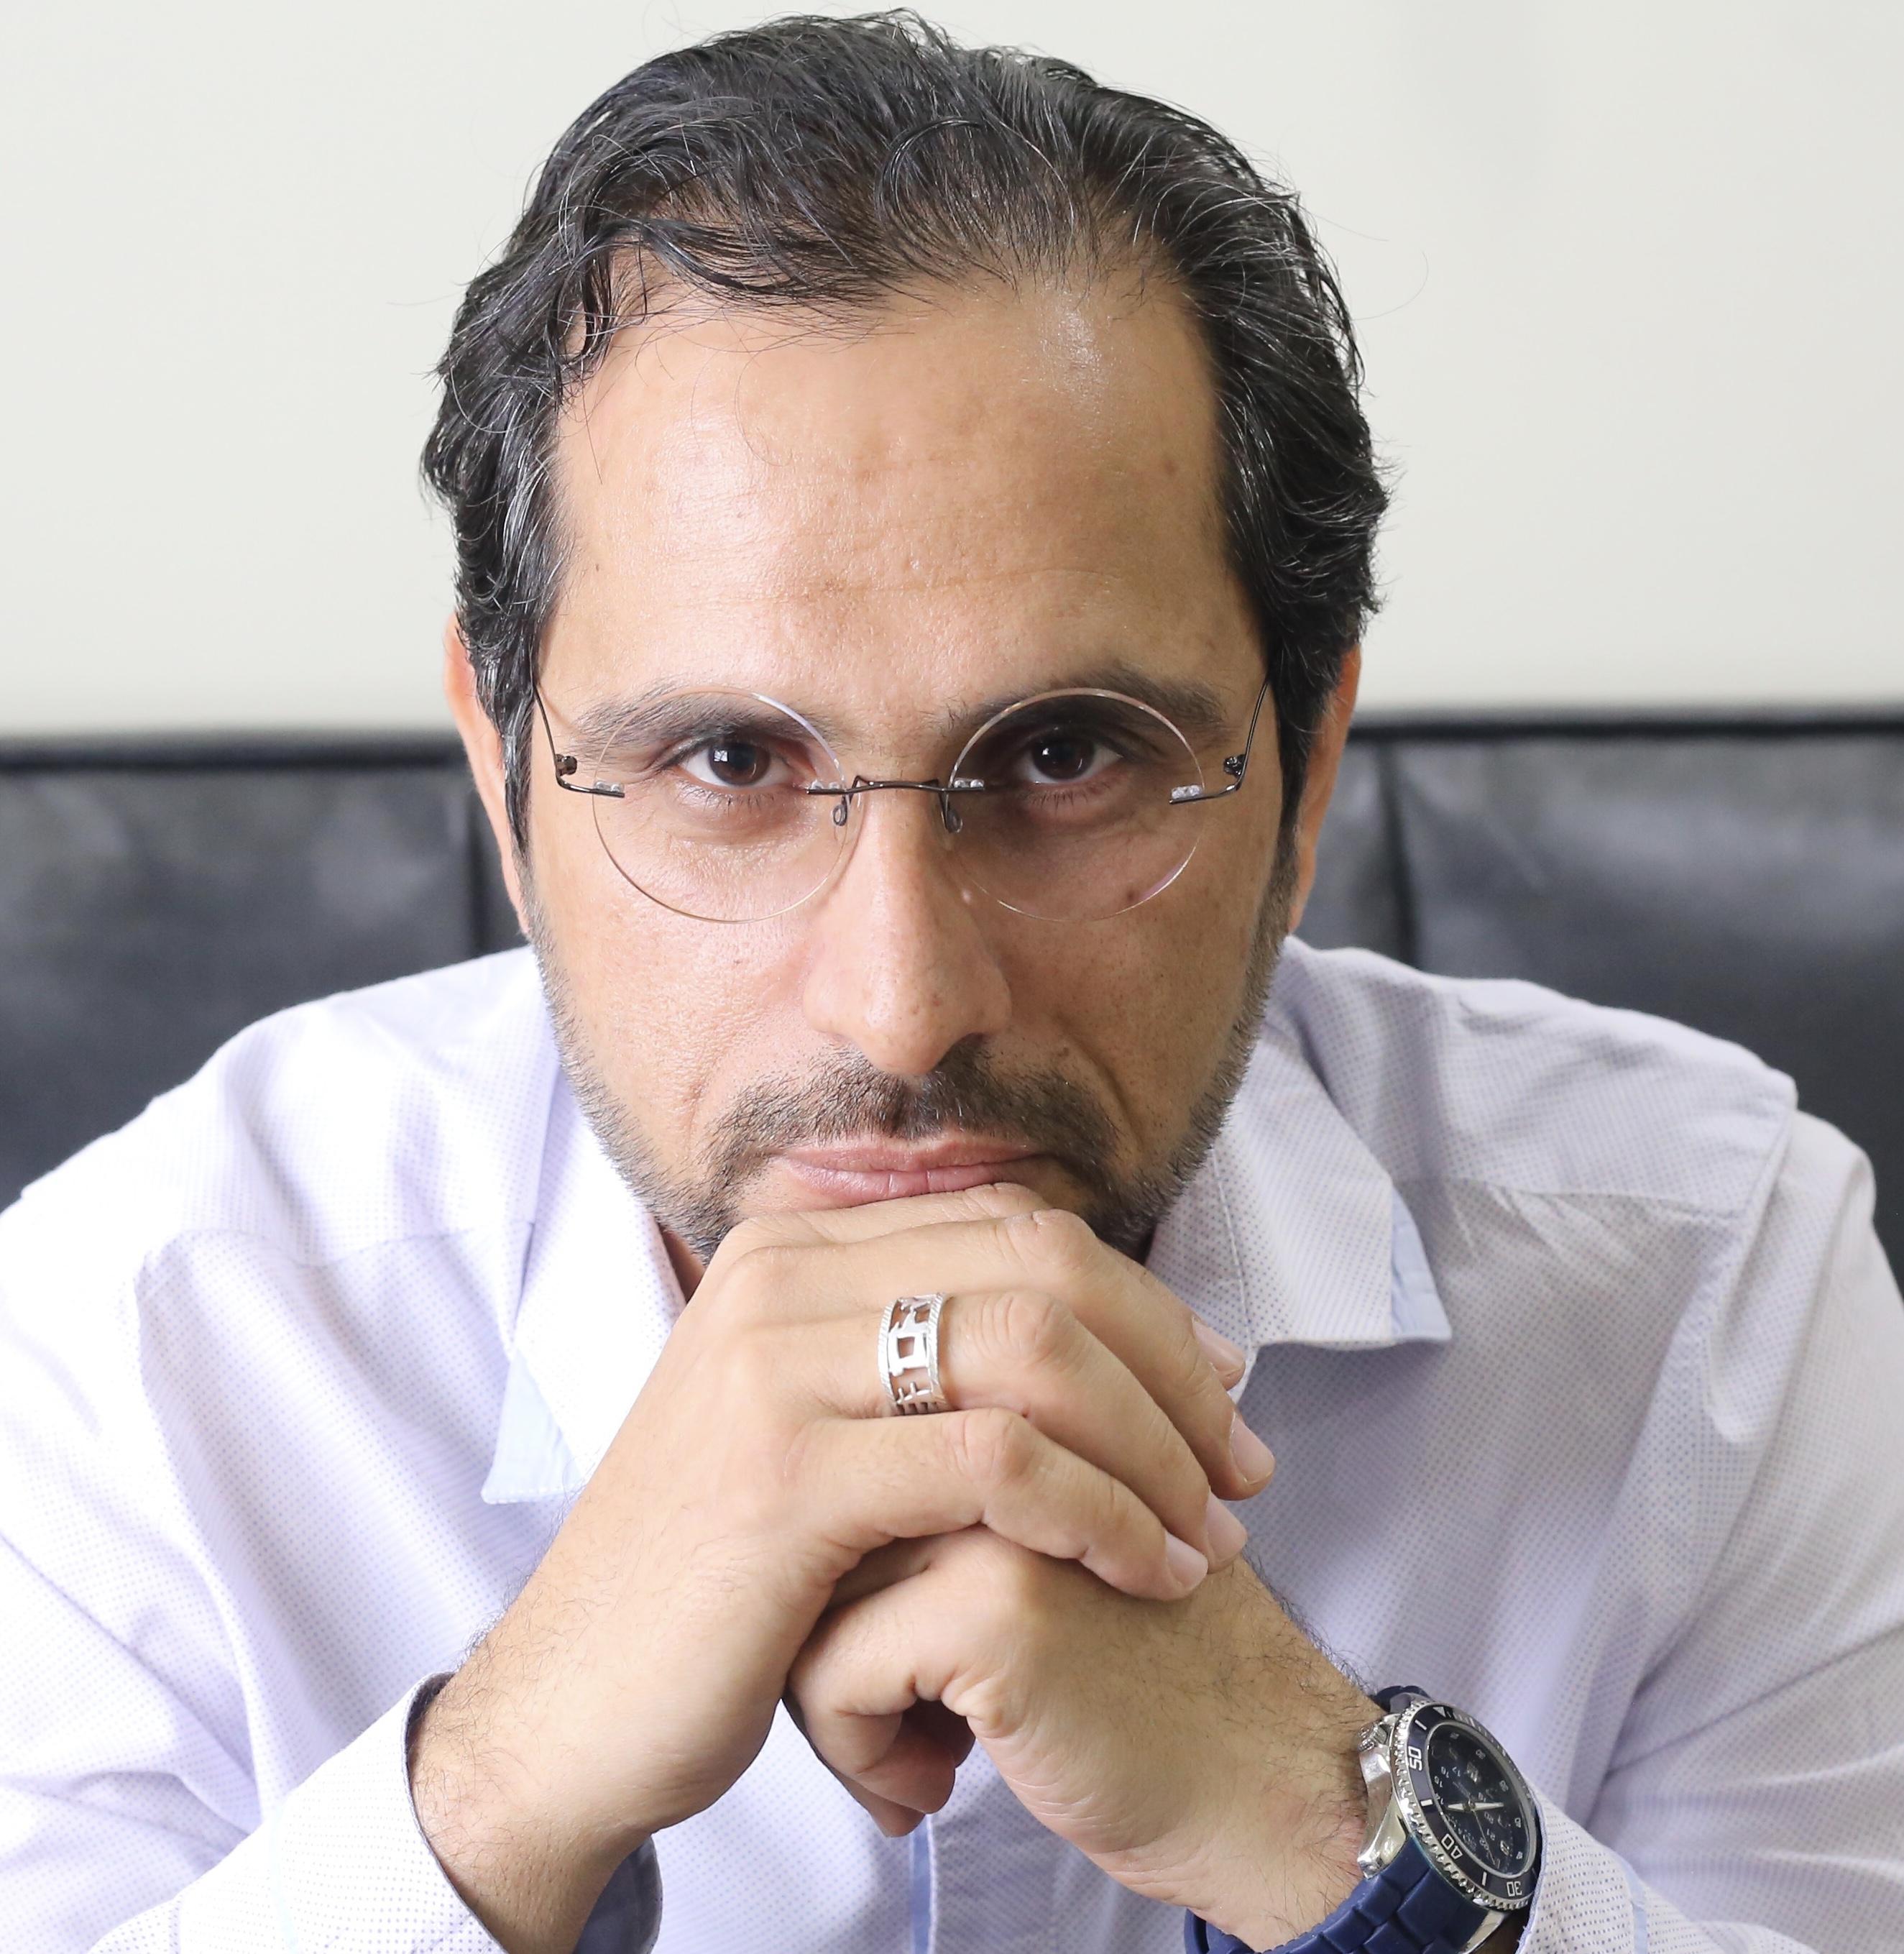 Jaafar Hamza